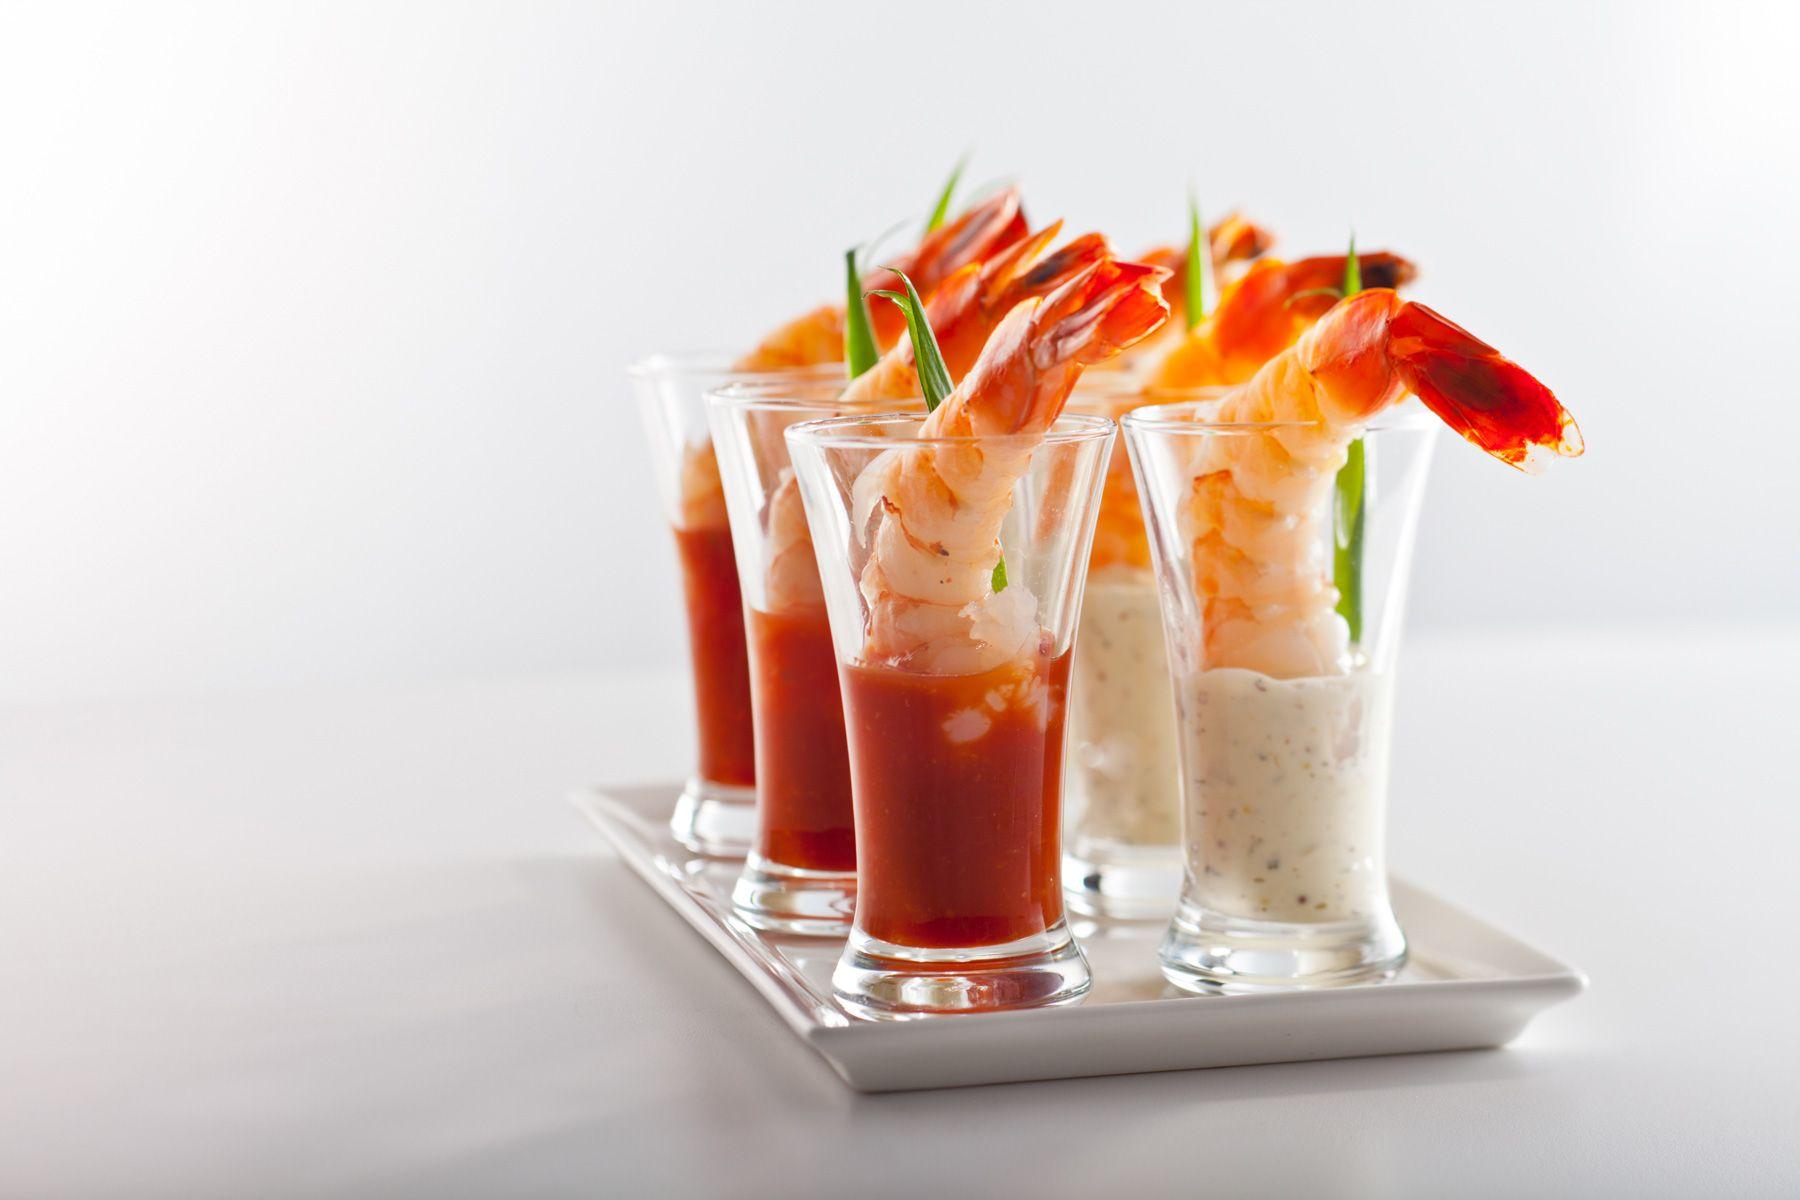 Shrimp-Cocktail-by-Chef-Michael-Garbin-Union-League-of-Chicago.jpg